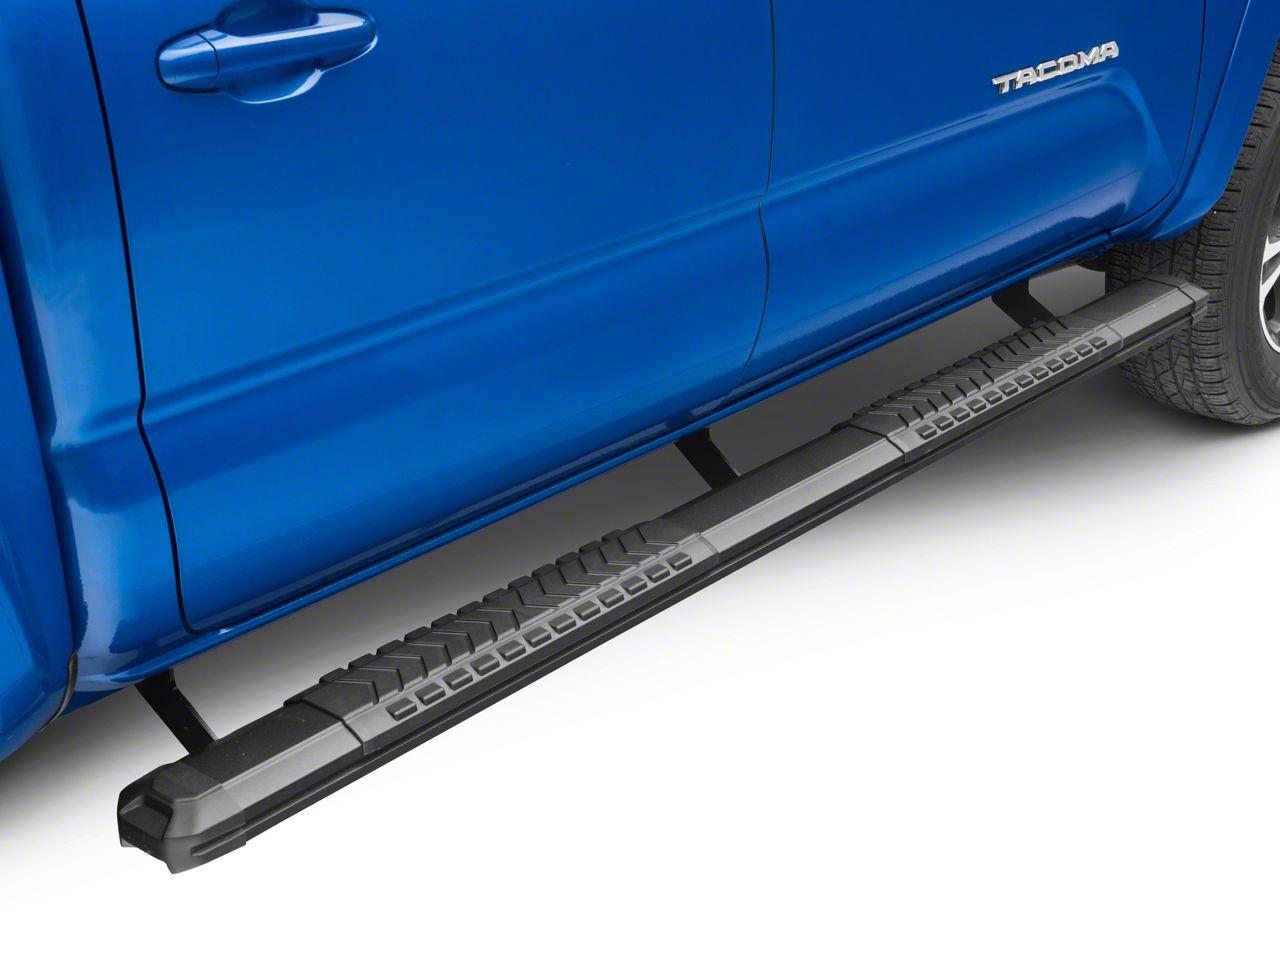 Steel Craft STX400 Aluminum Step Boards - Black (05-19 Tacoma Double Cab)